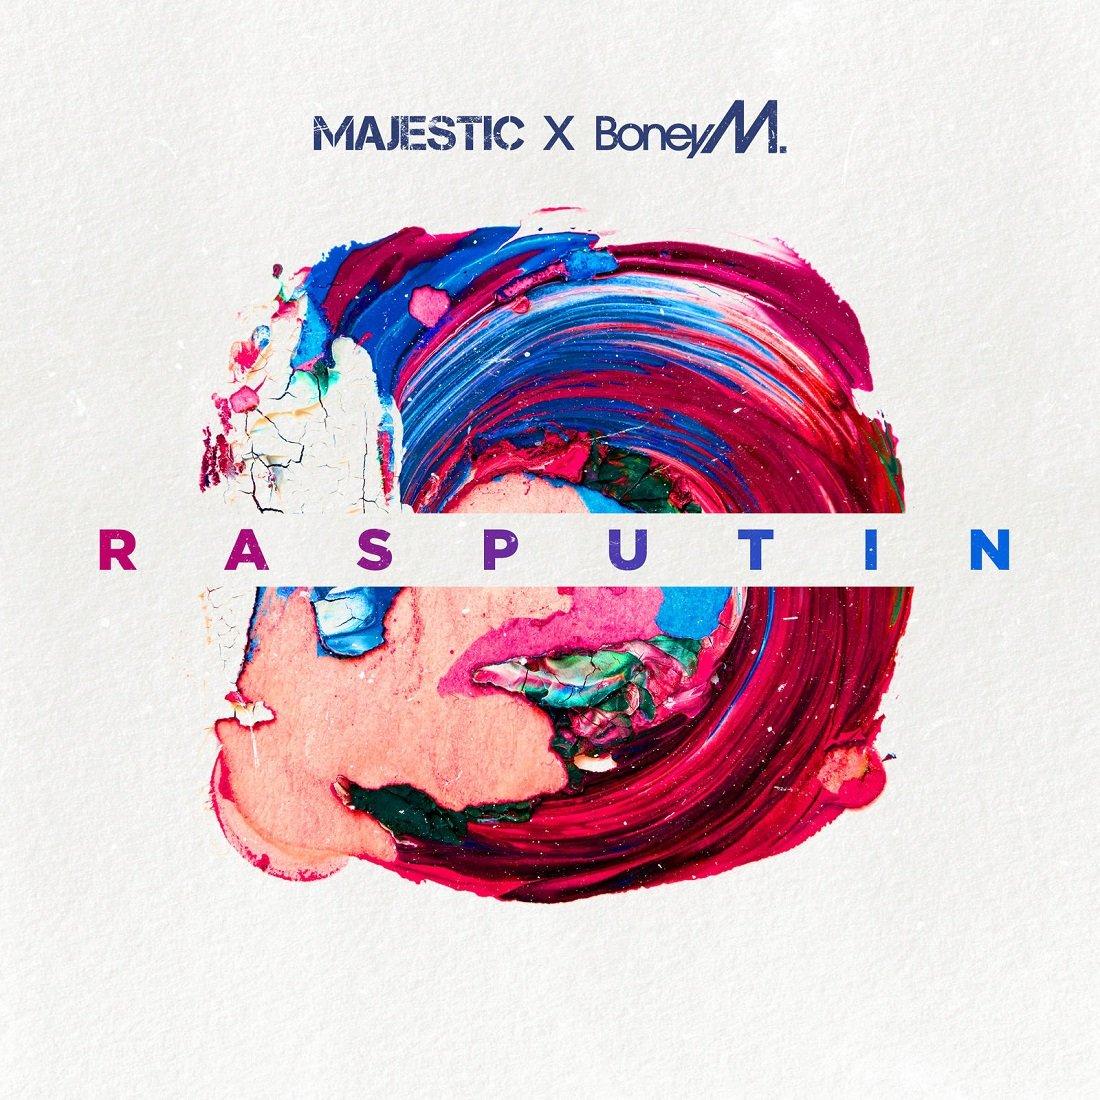 Majestic x Boney M Rasputin (2021 Remix)